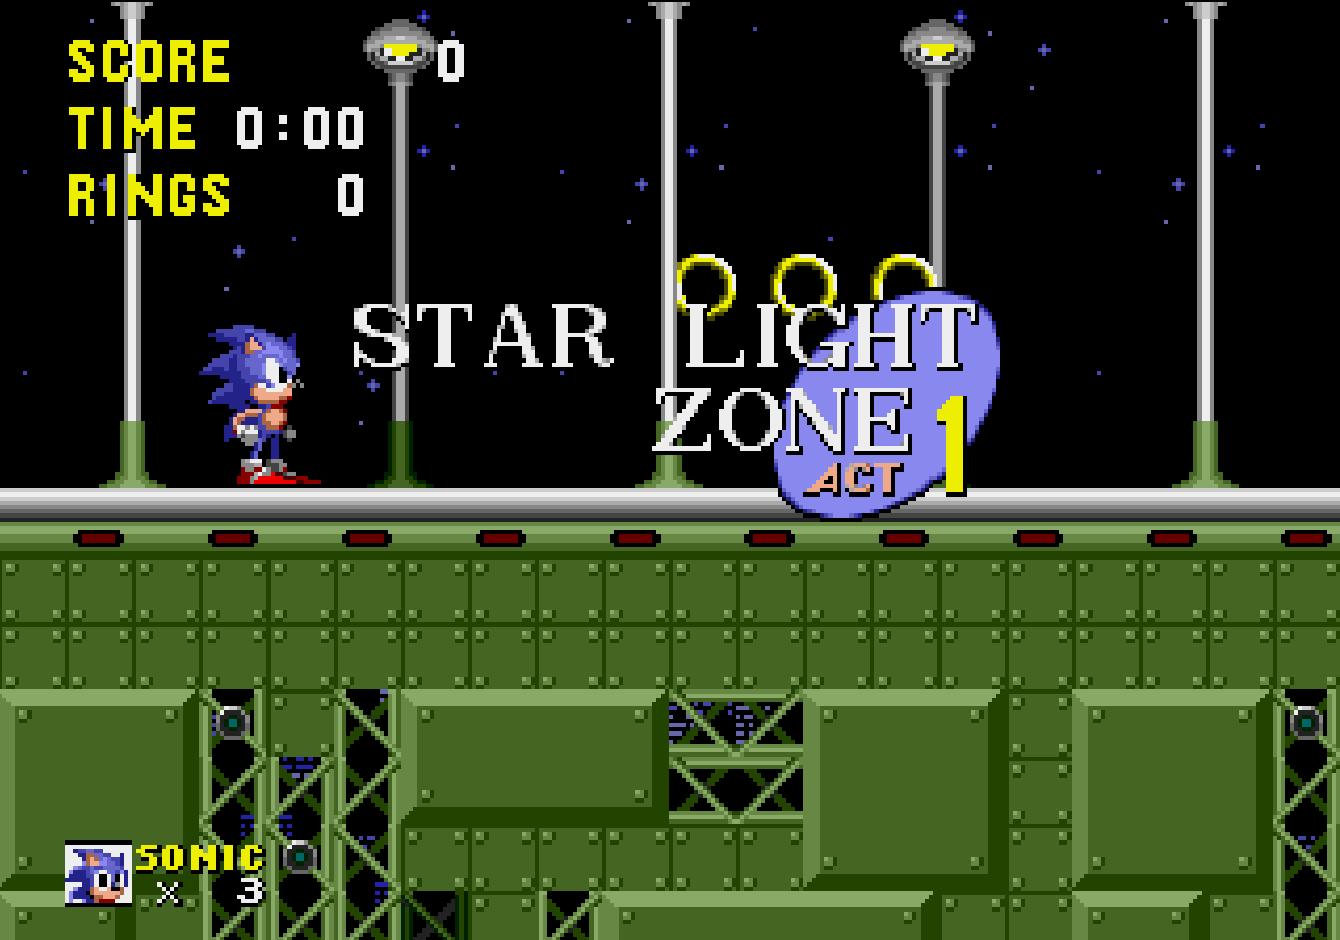 Star Light Zone